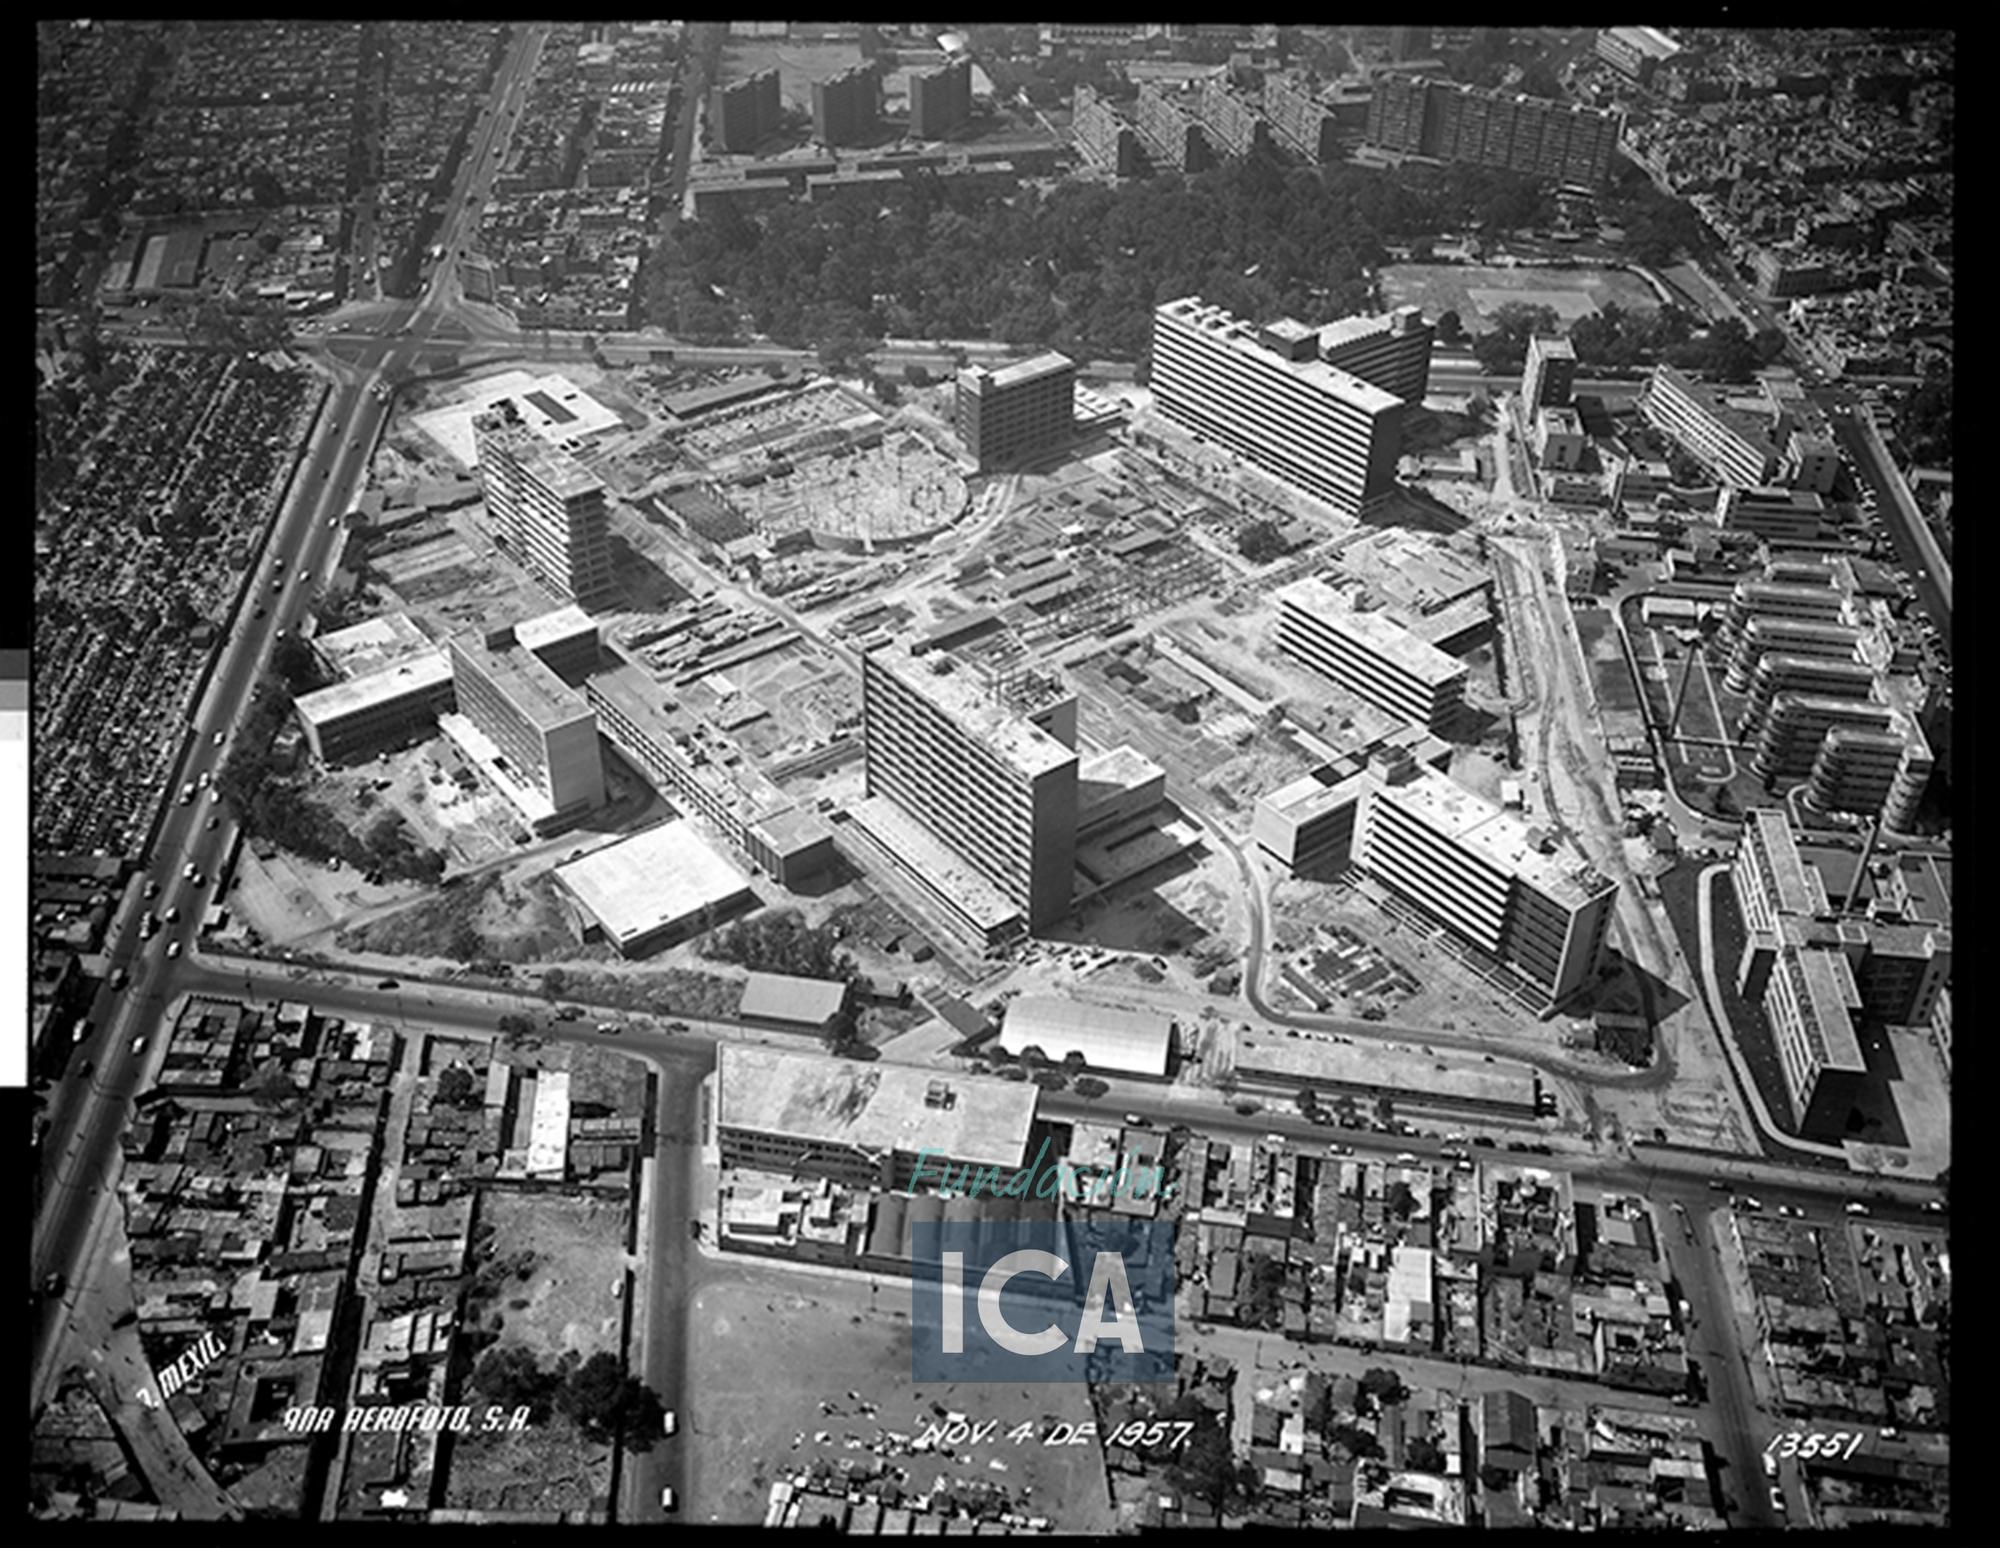 Arquitectura hospitalaria el centro m dico nacional siglo xxi en ciudad de m xico archdaily - Centro deportivo siglo xxi zaragoza ...